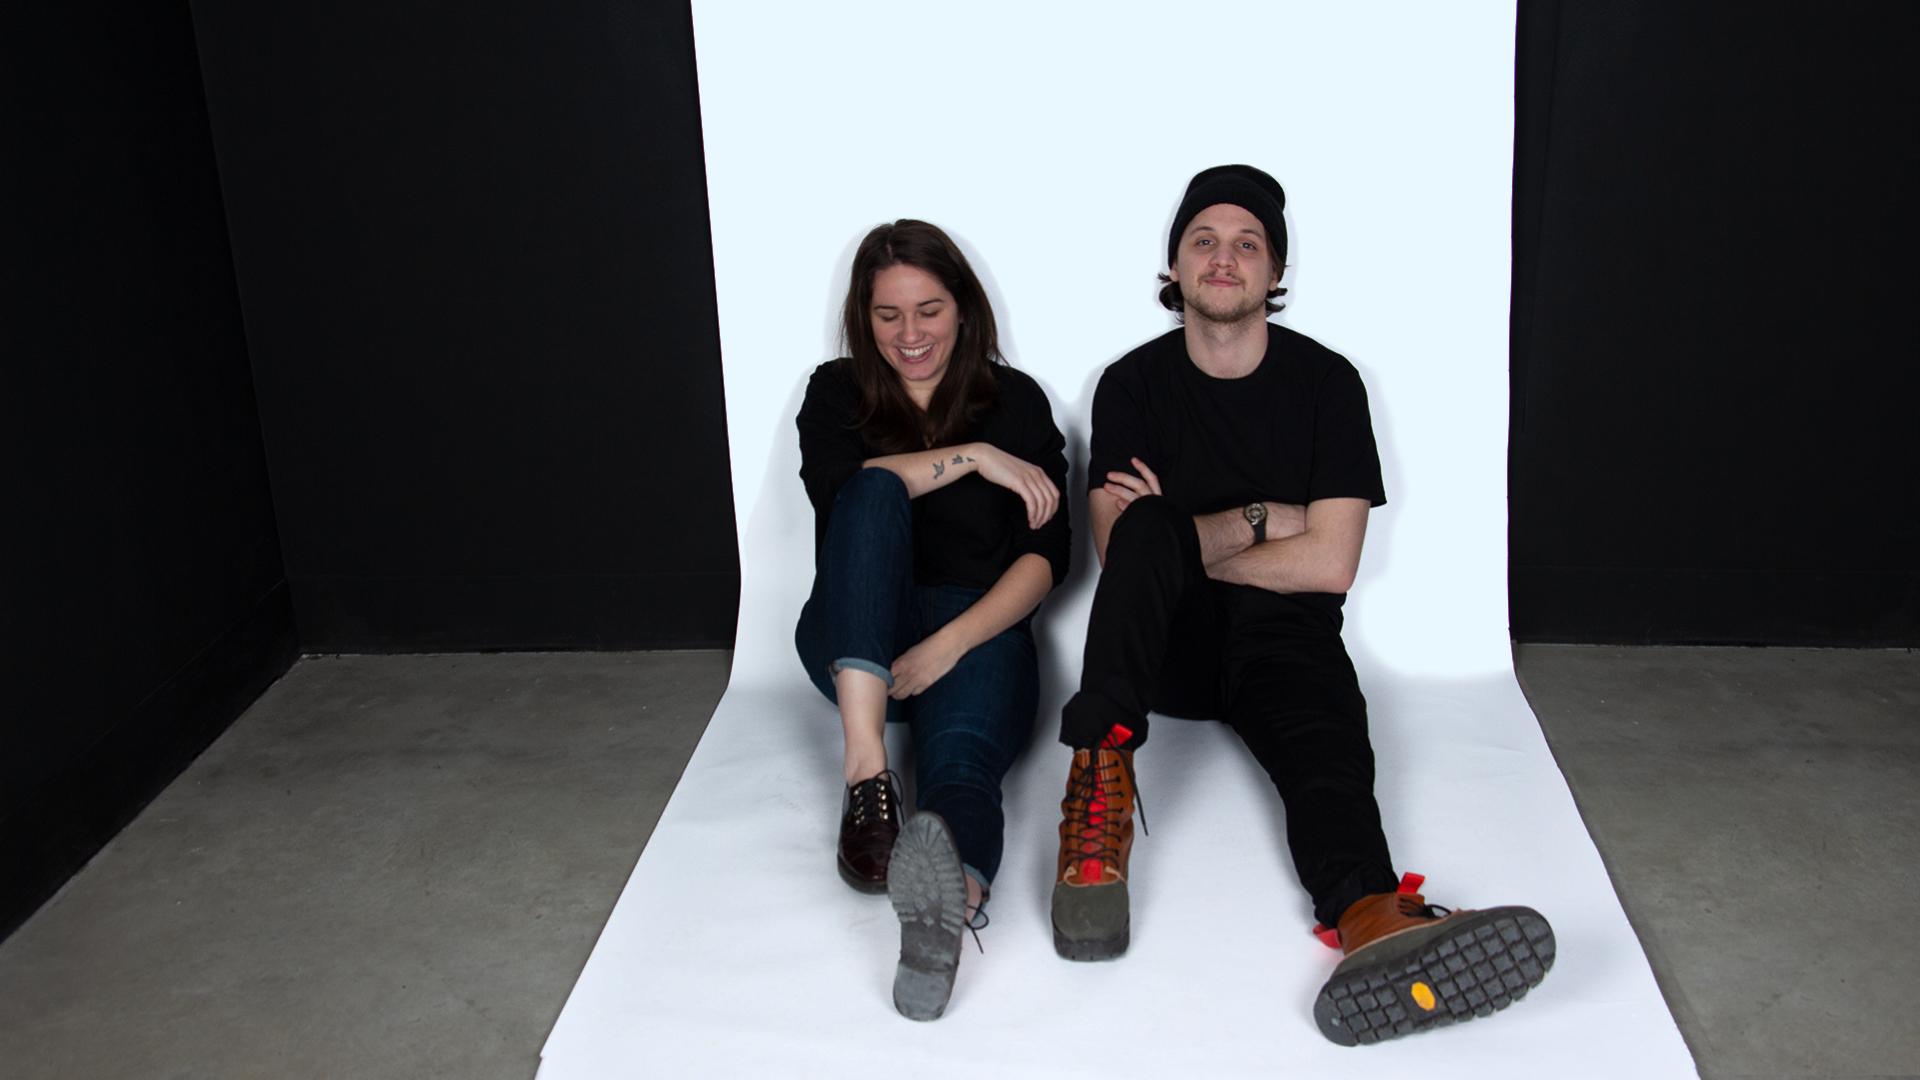 Highlighter Studio team photo